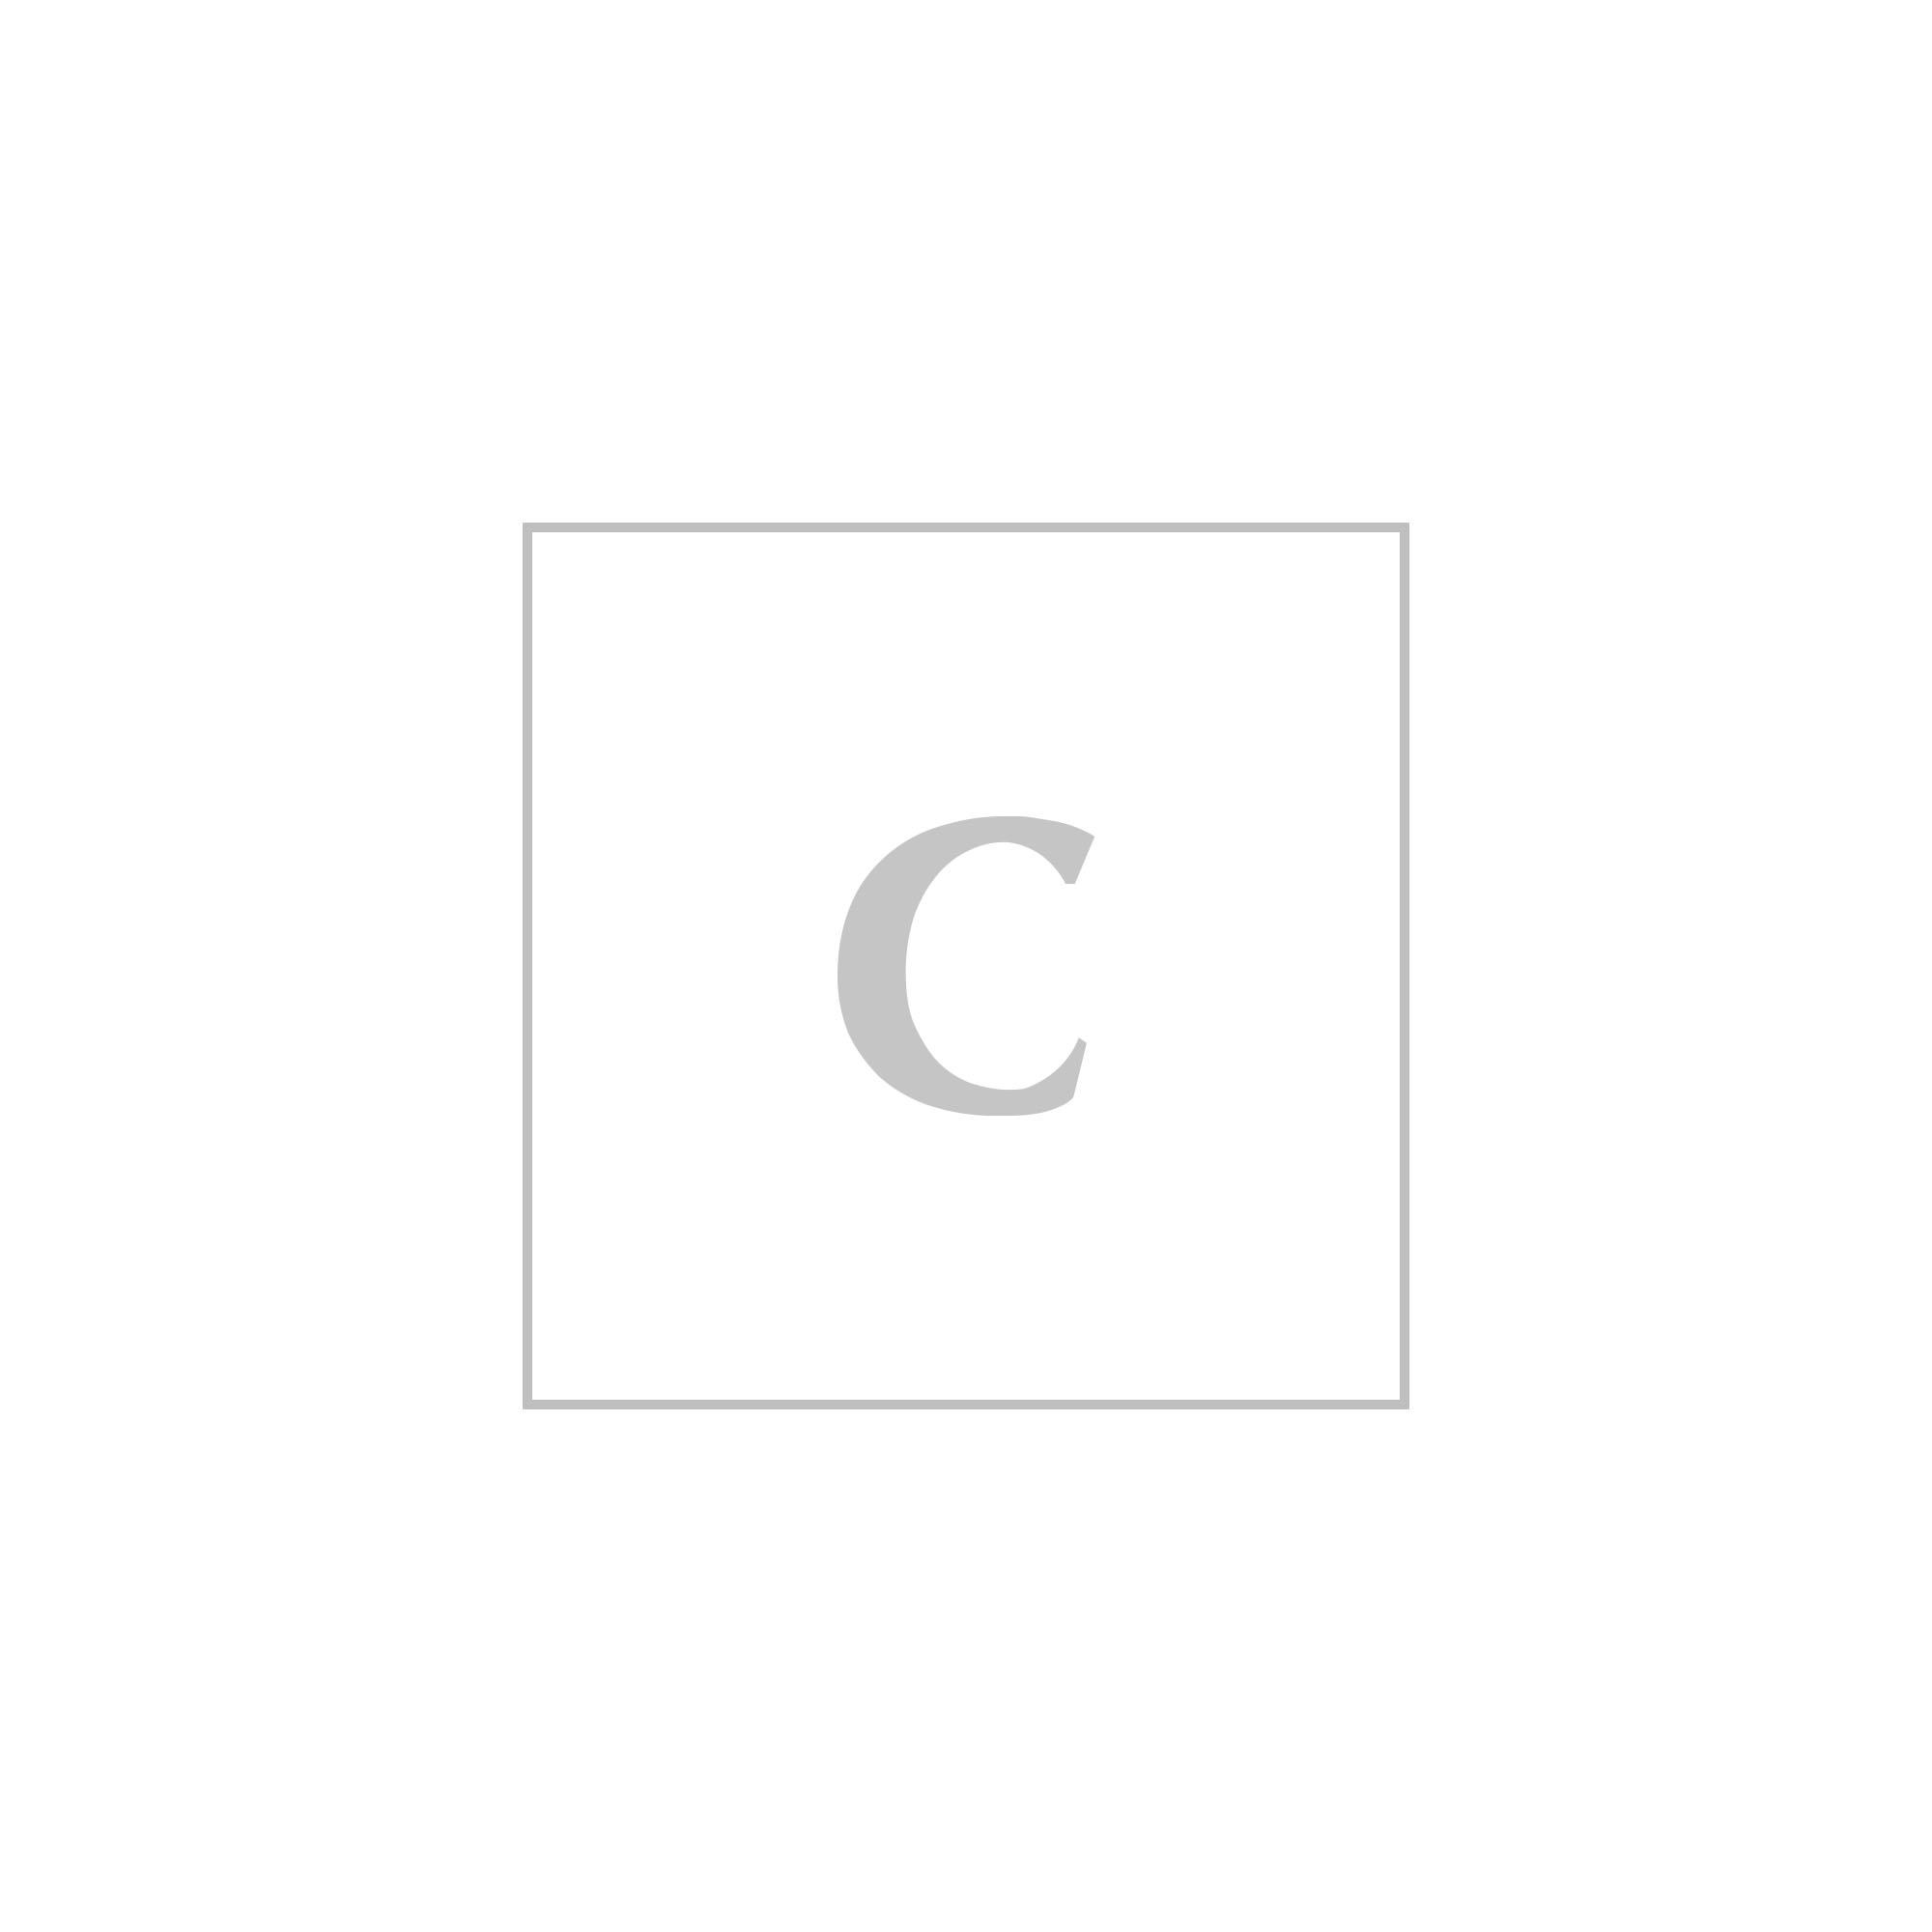 Saint laurent ysl borsa monogramme nappa